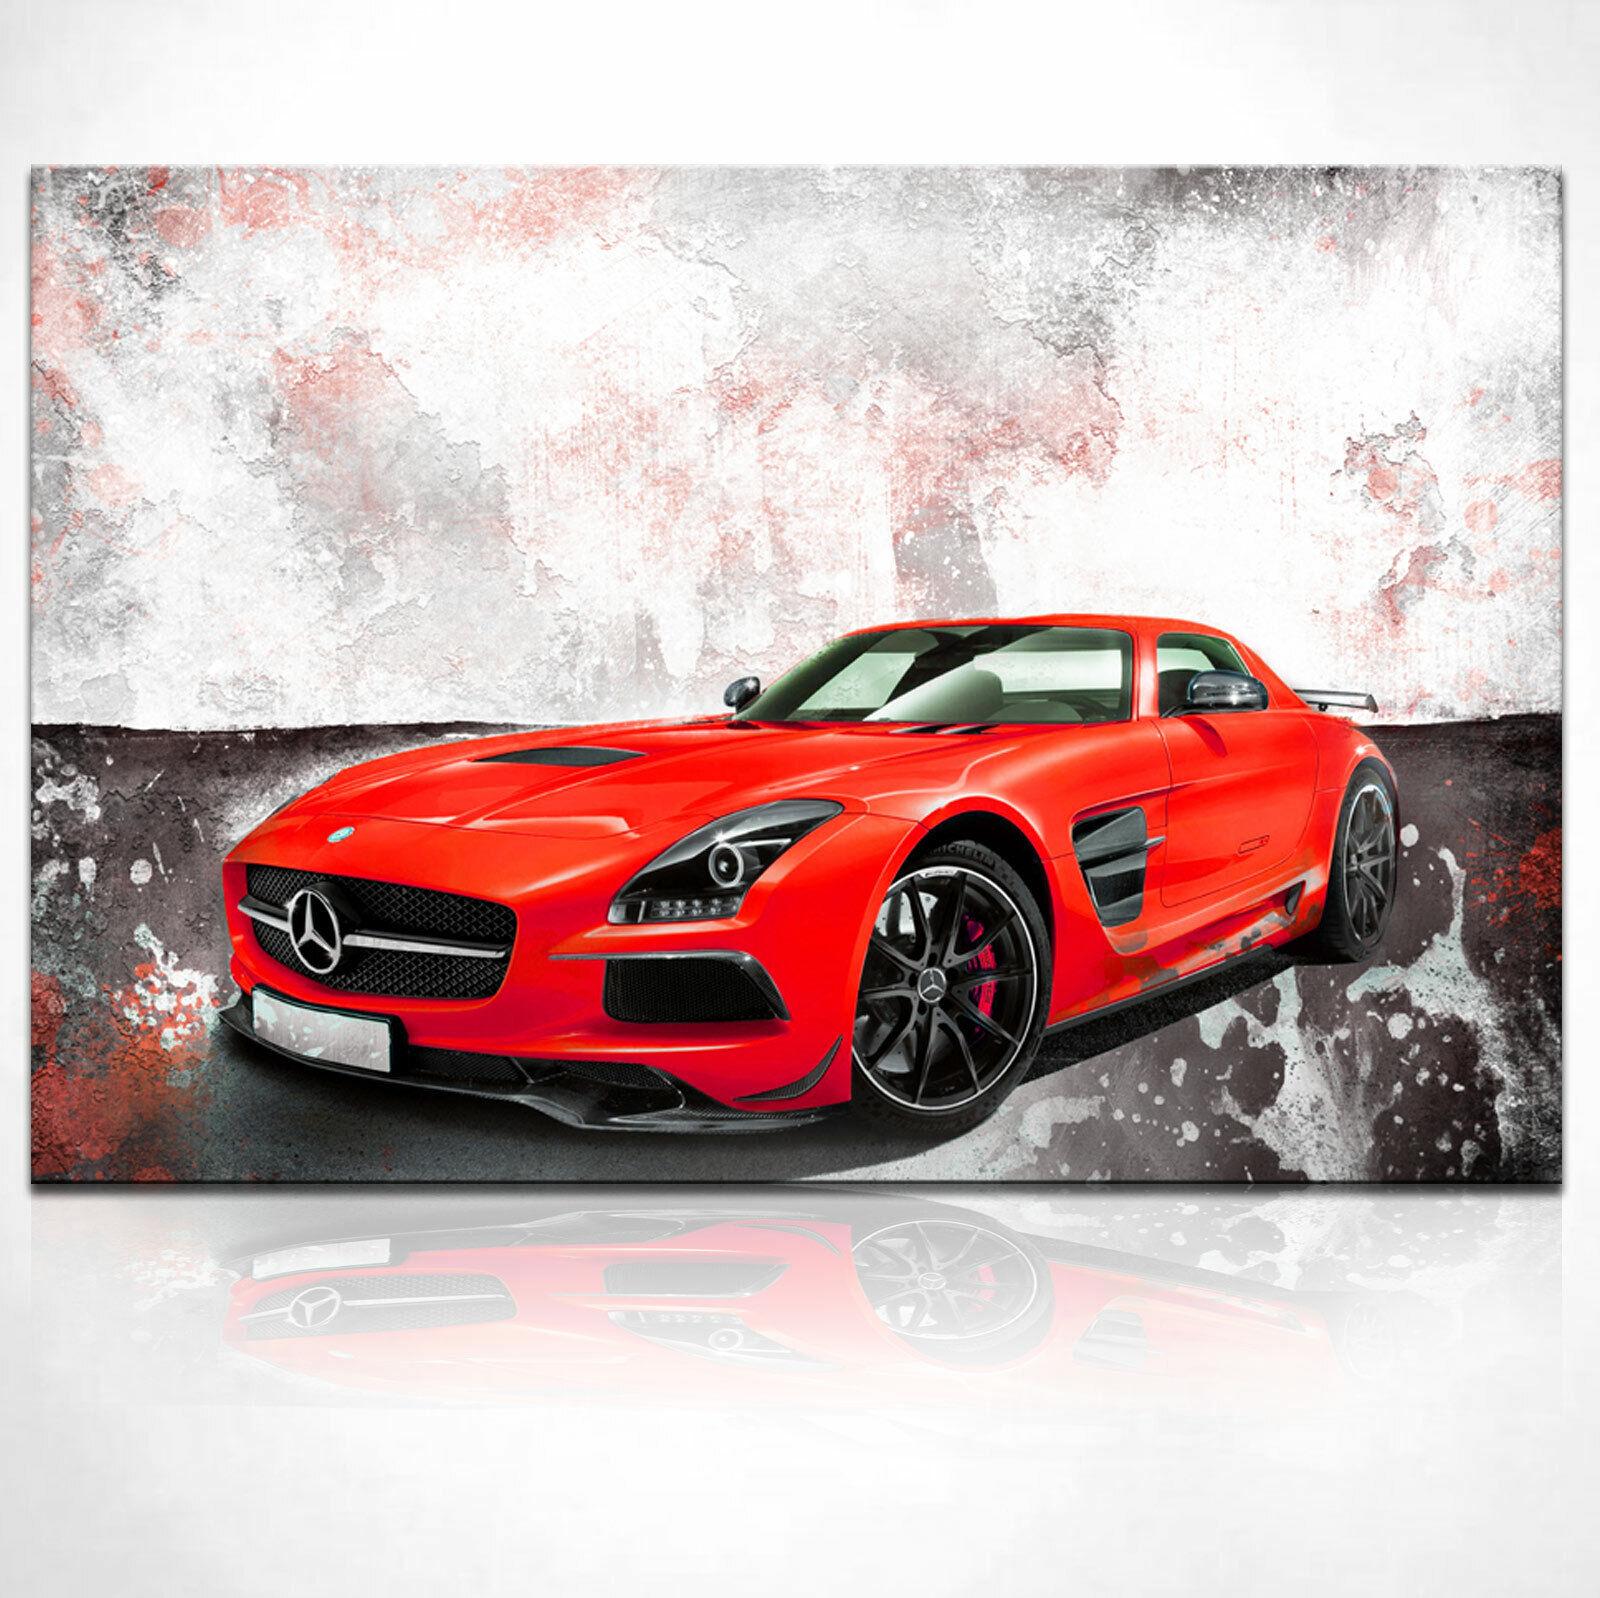 Auto Mercedes SLS AMG Sportwagen Bild Abstrakt Leinwand Bilder Wandbilder D1961